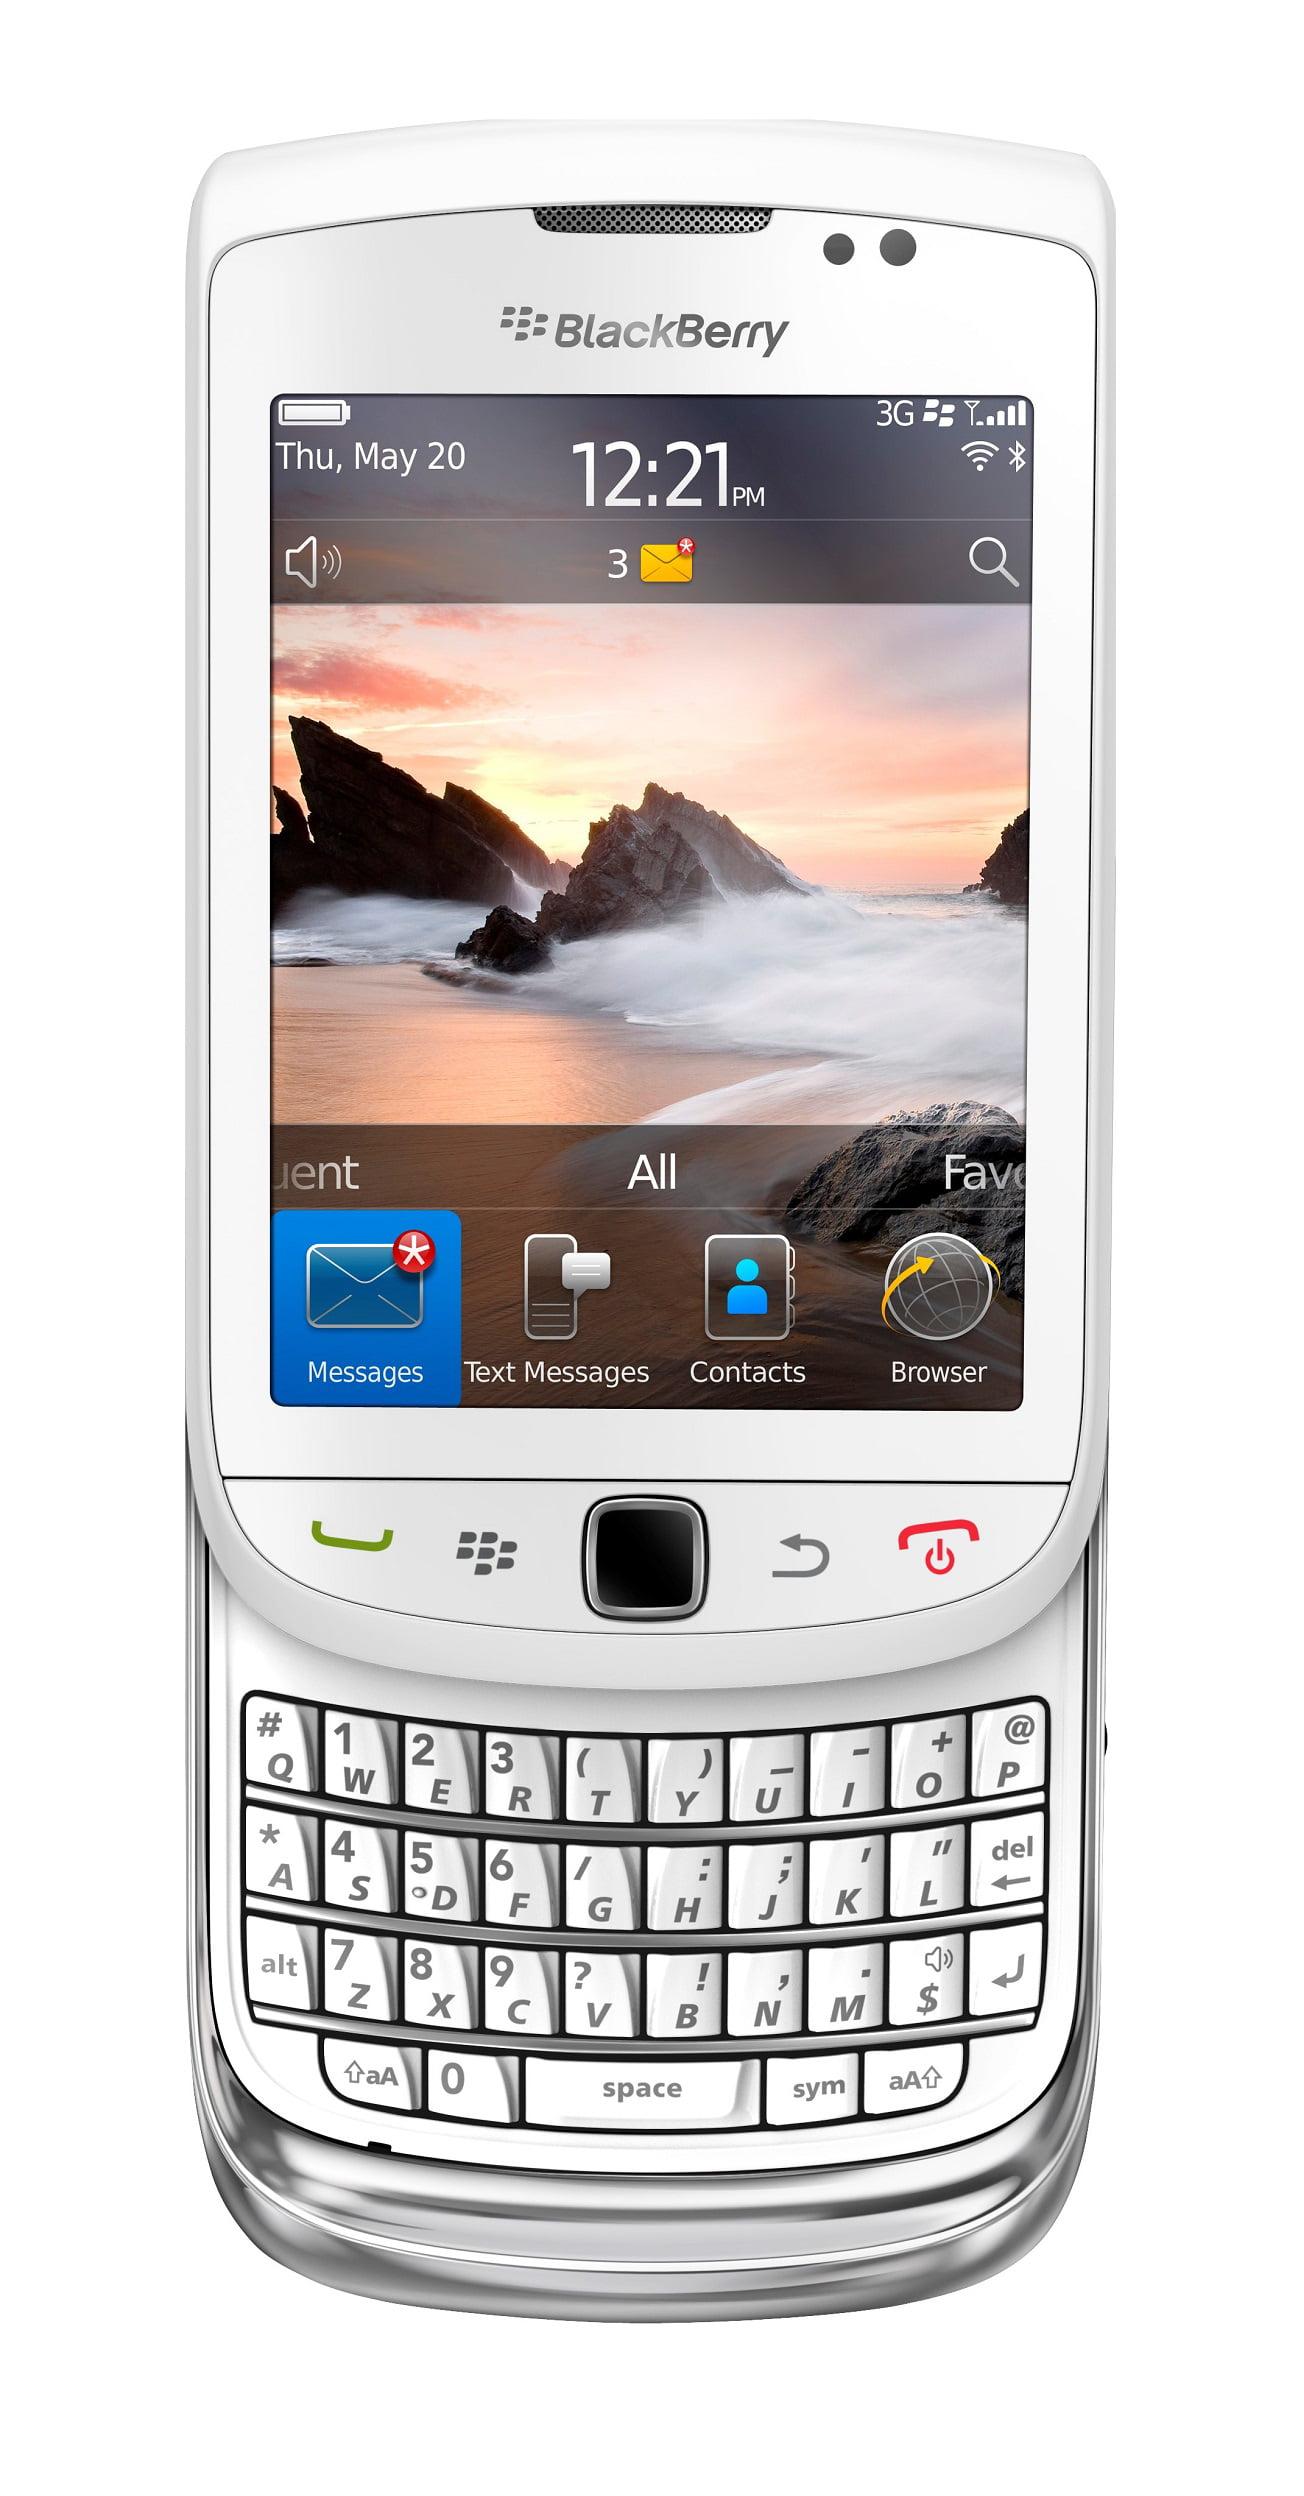 Blackberry Torch 9810 Unlocked GSM HSPA+ OS 7.0 Slider Cell Phone - White -  Walmart.com